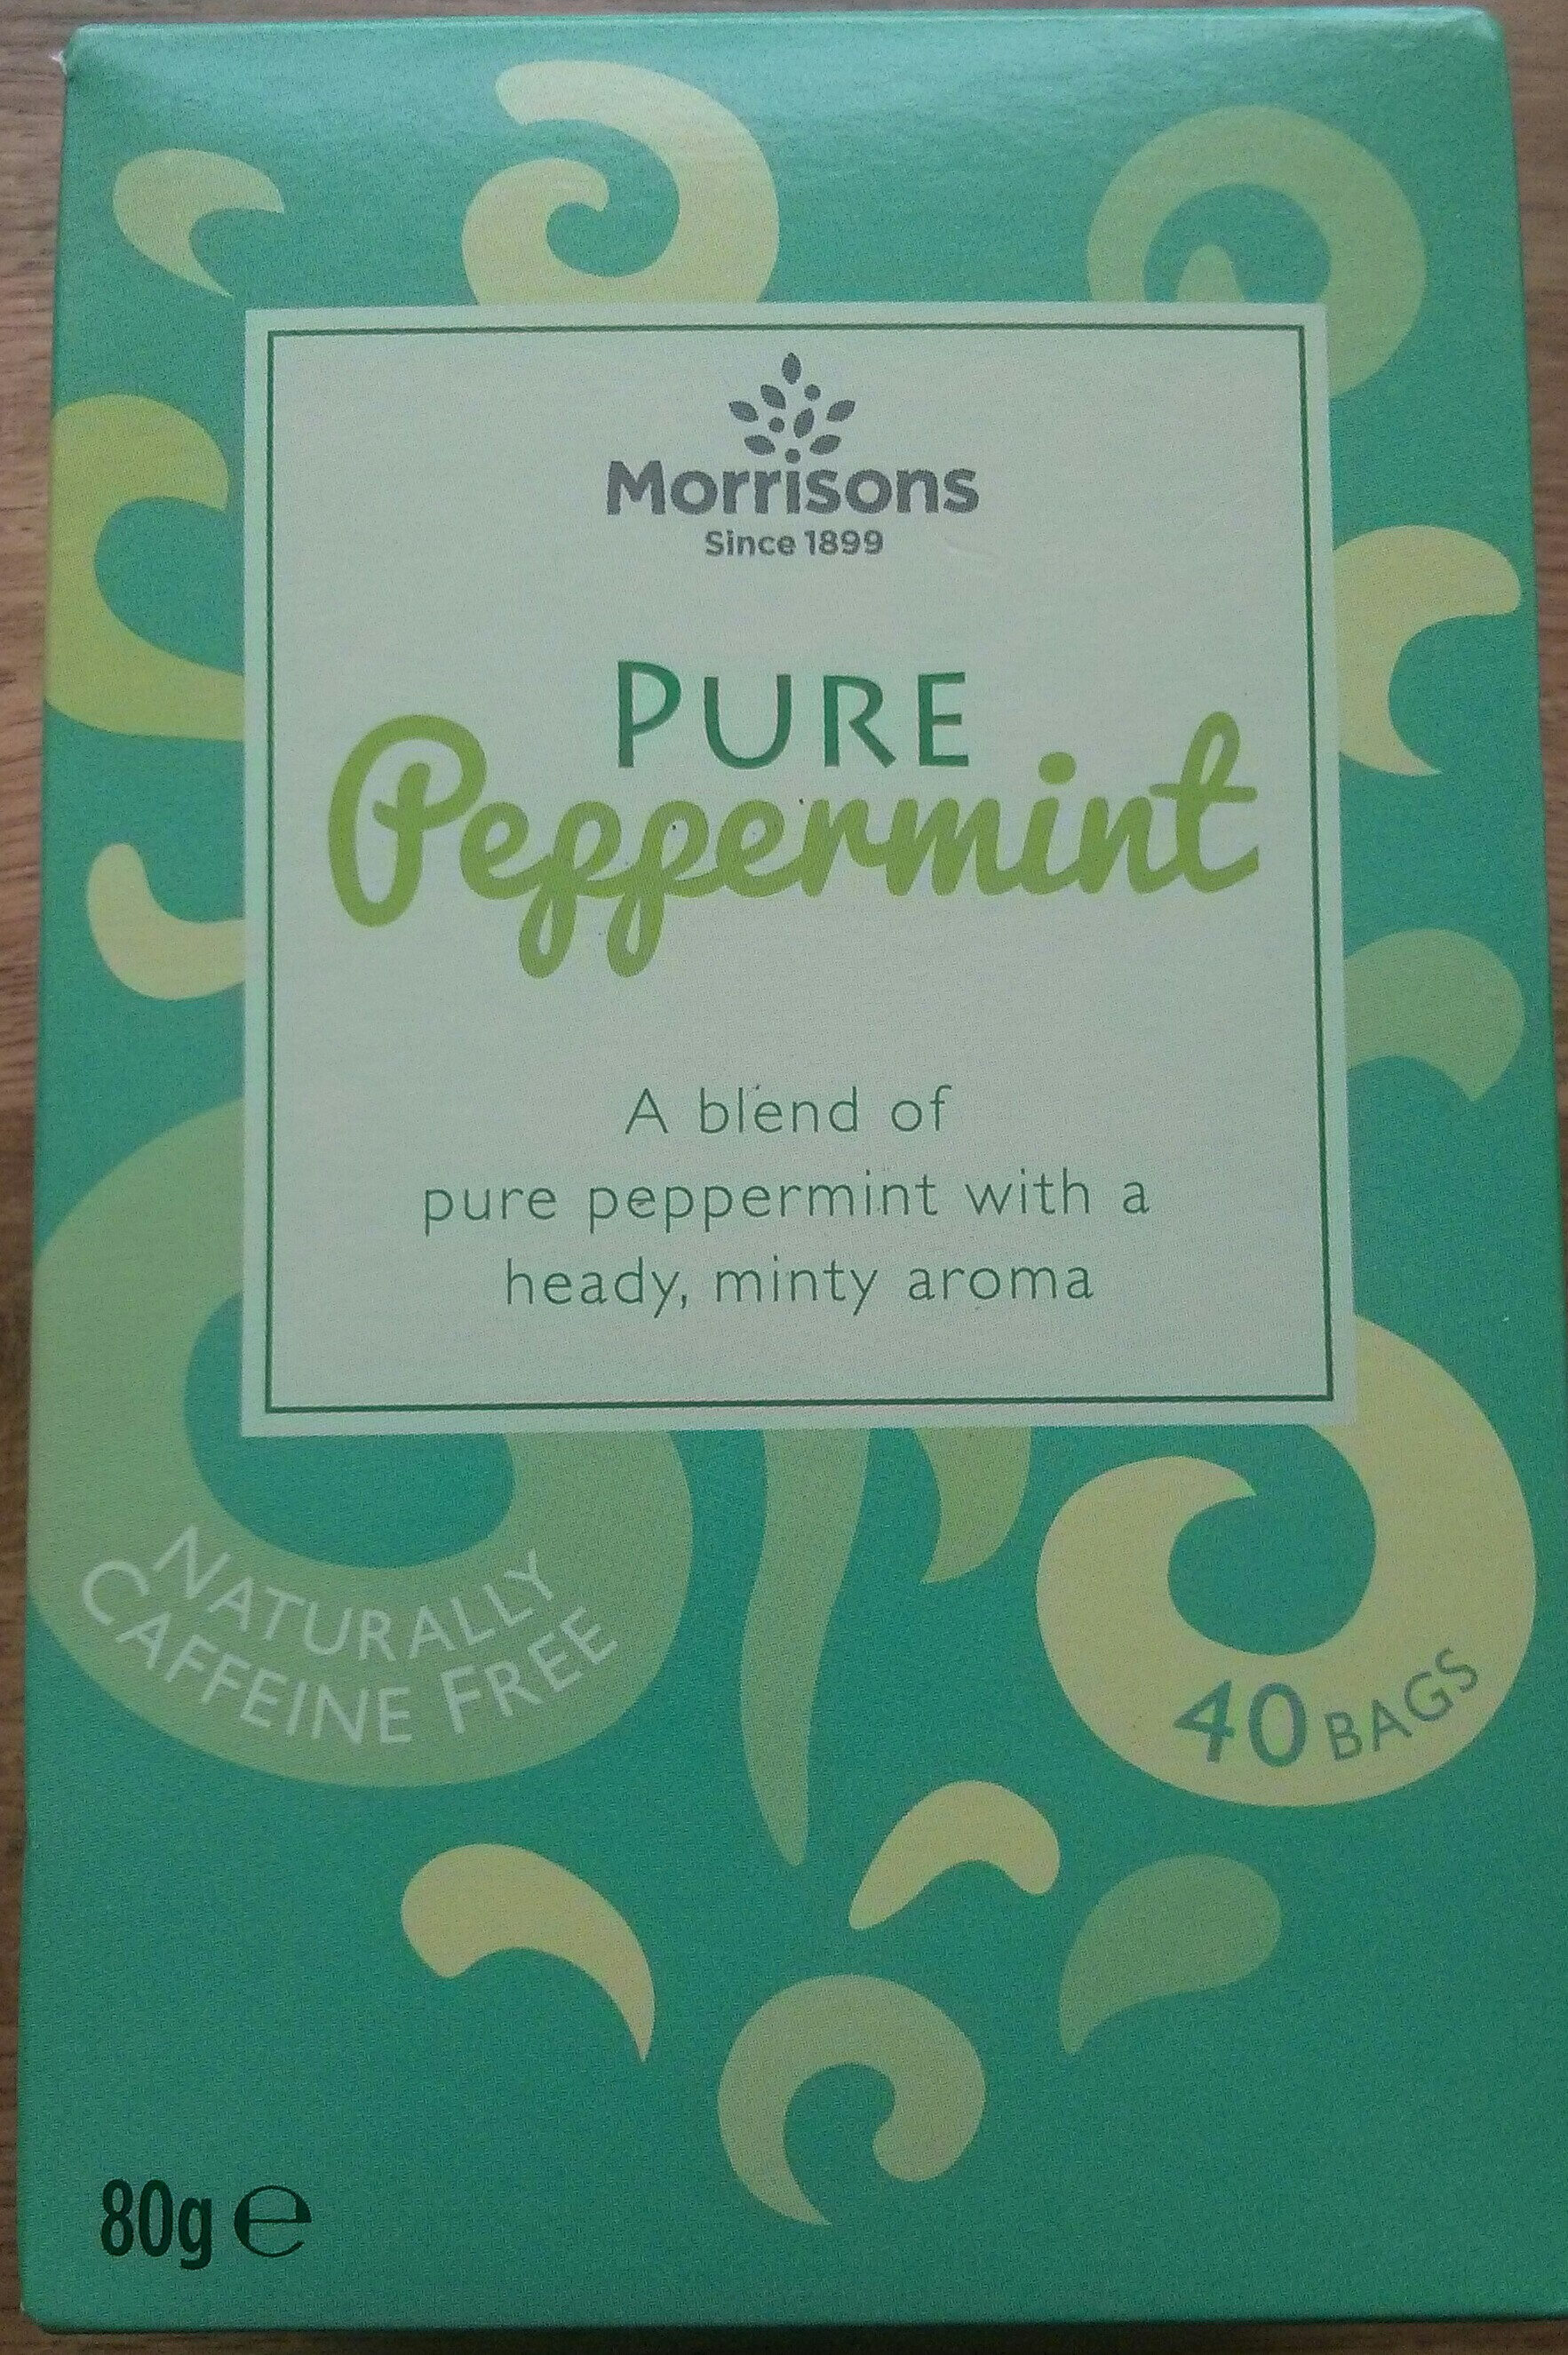 Pure Peppermint - Product - en